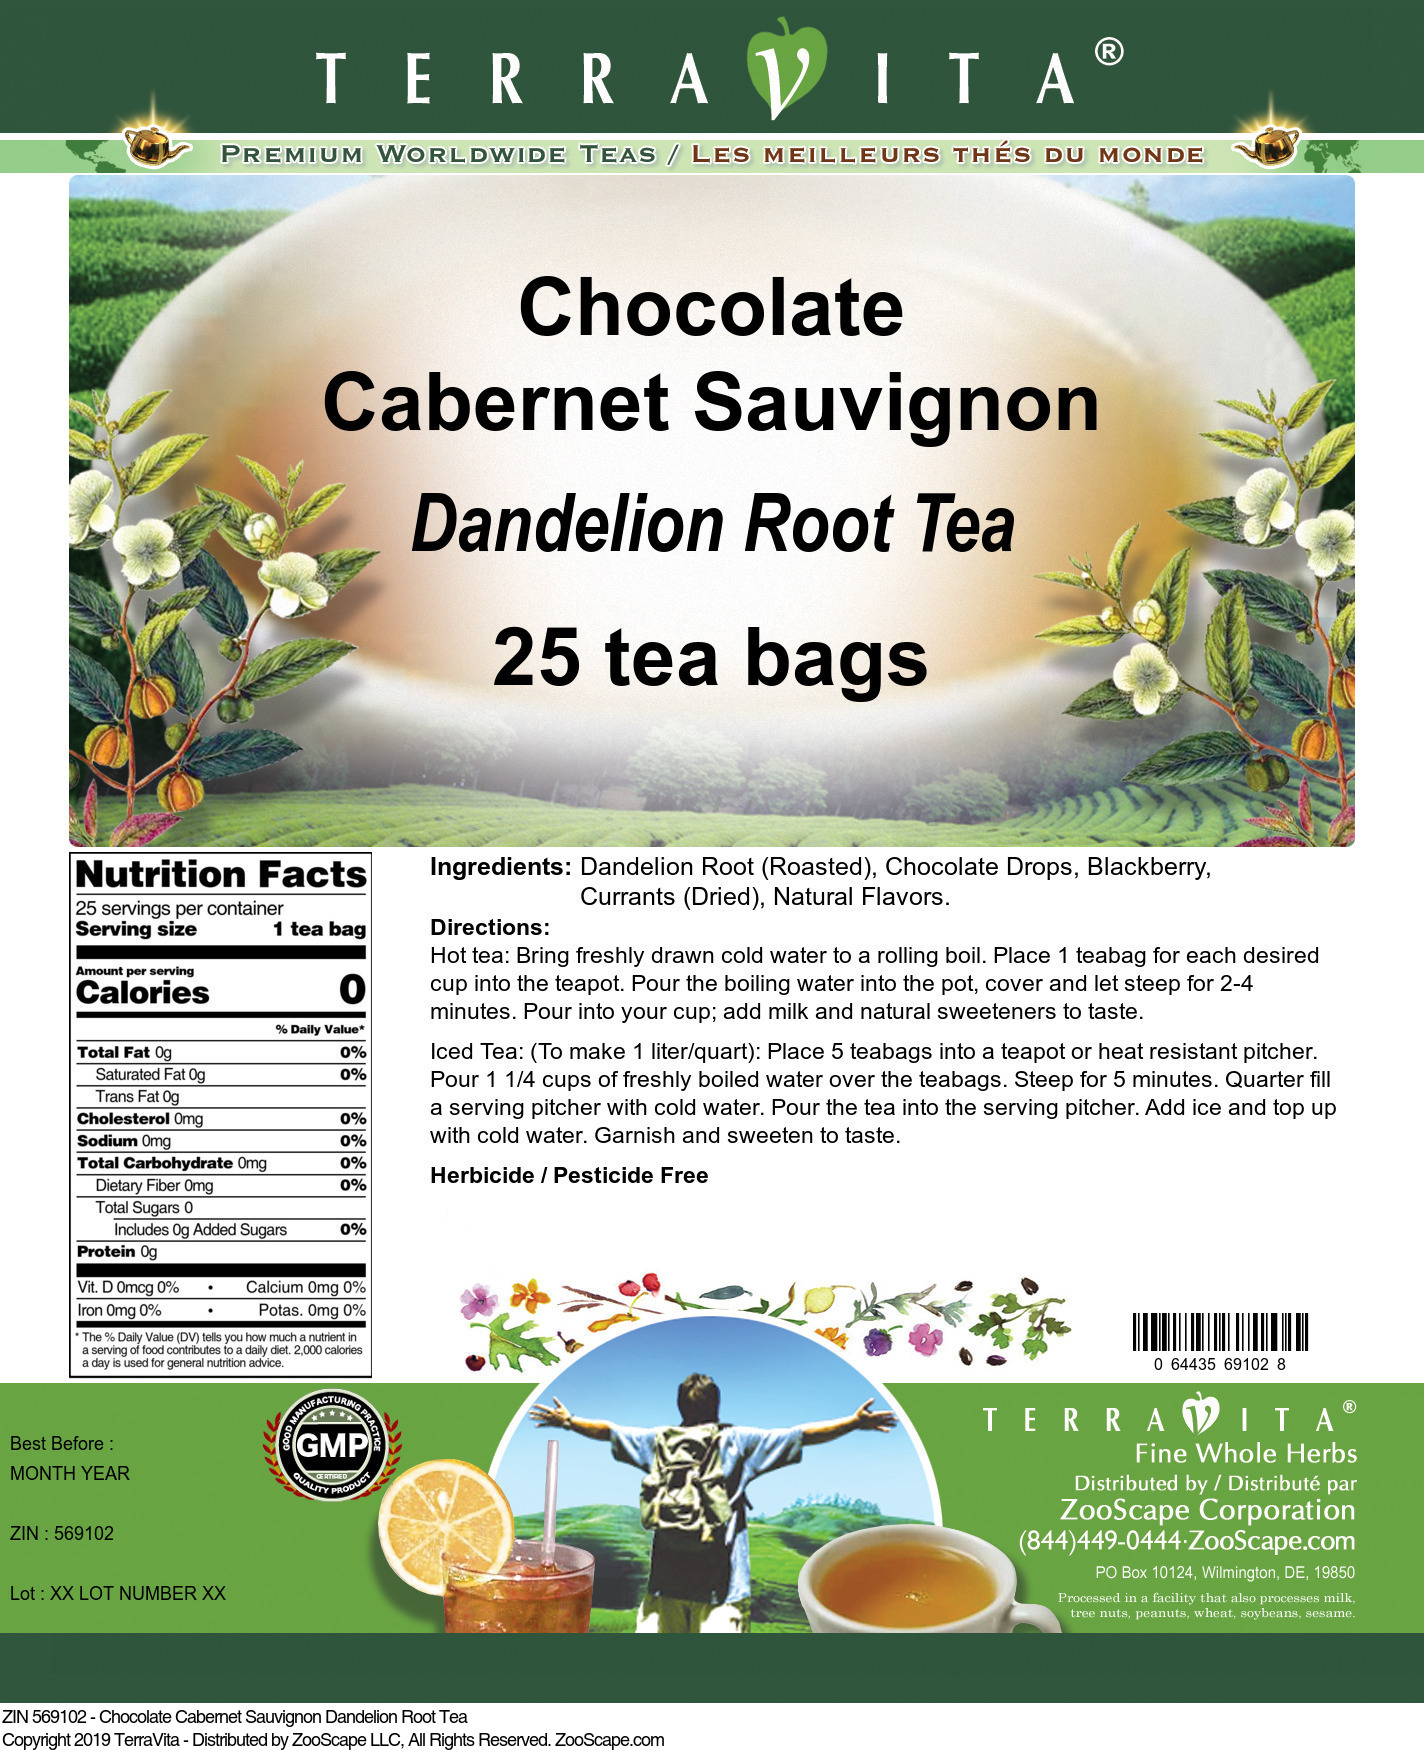 Chocolate Cabernet Sauvignon Dandelion Root Tea